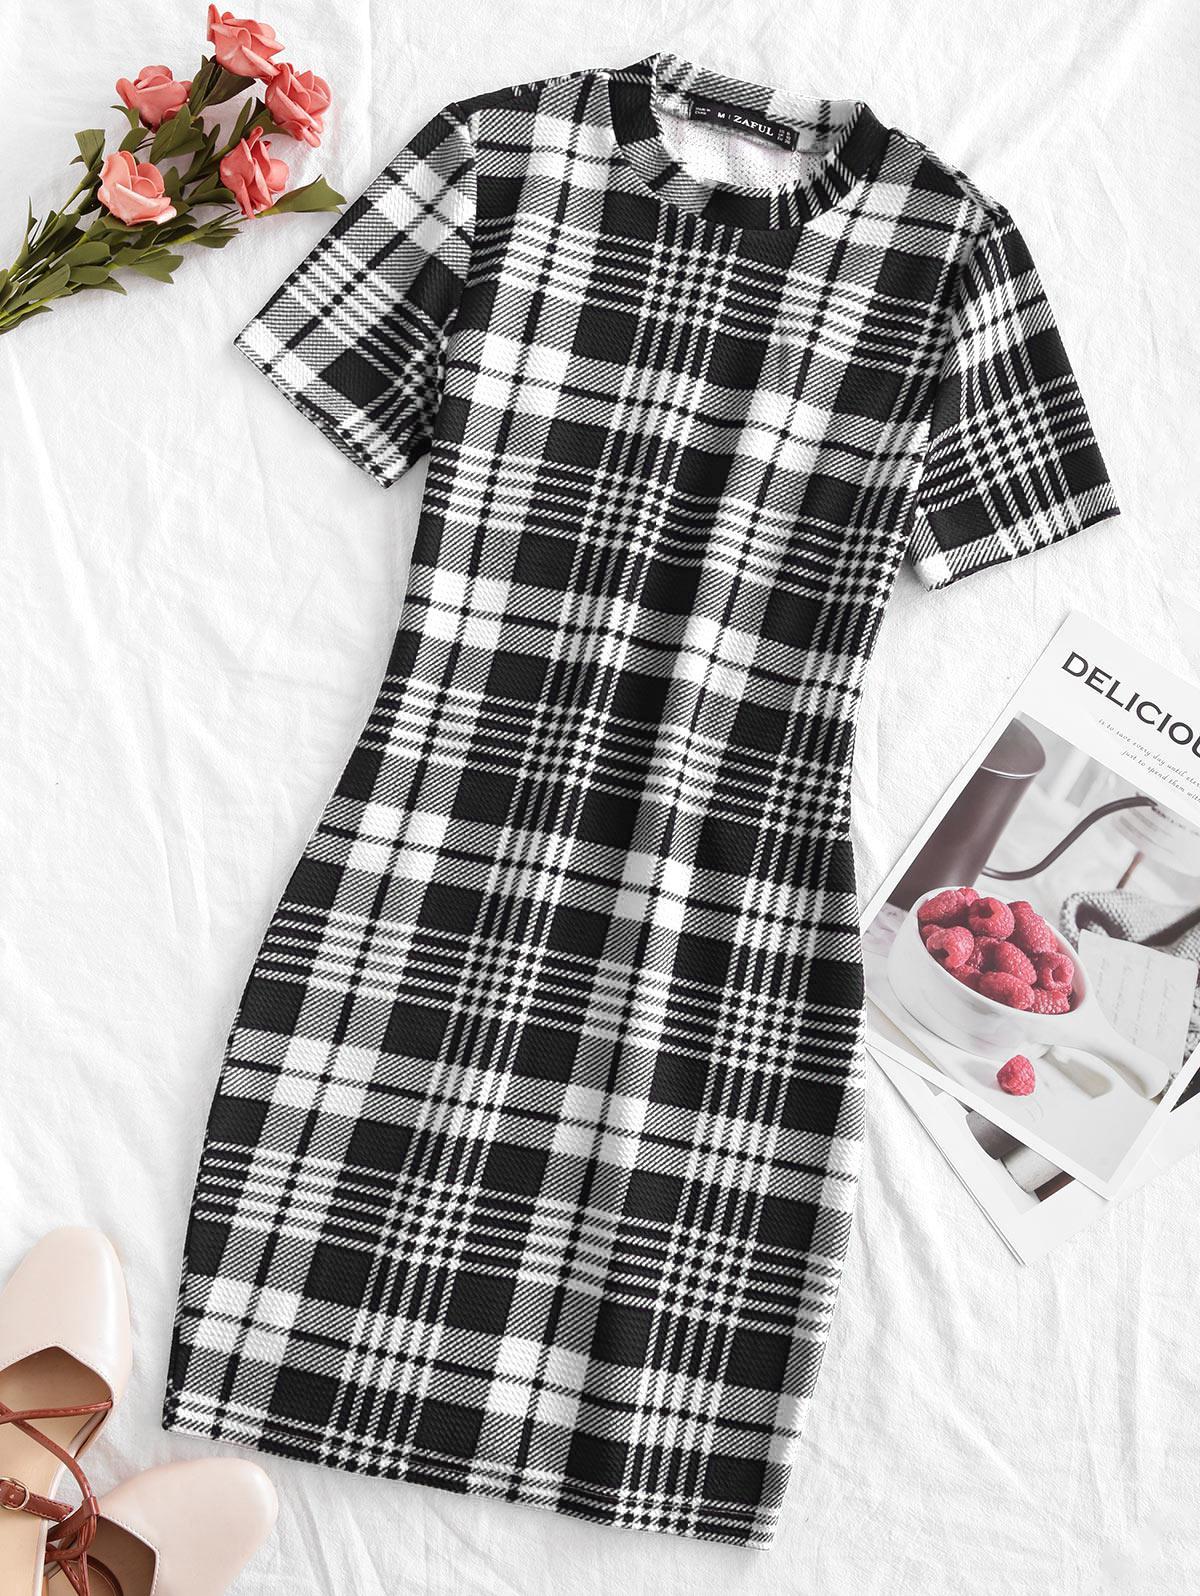 ZAFUL Houndstooth Plaid Mini Bodycon Dress